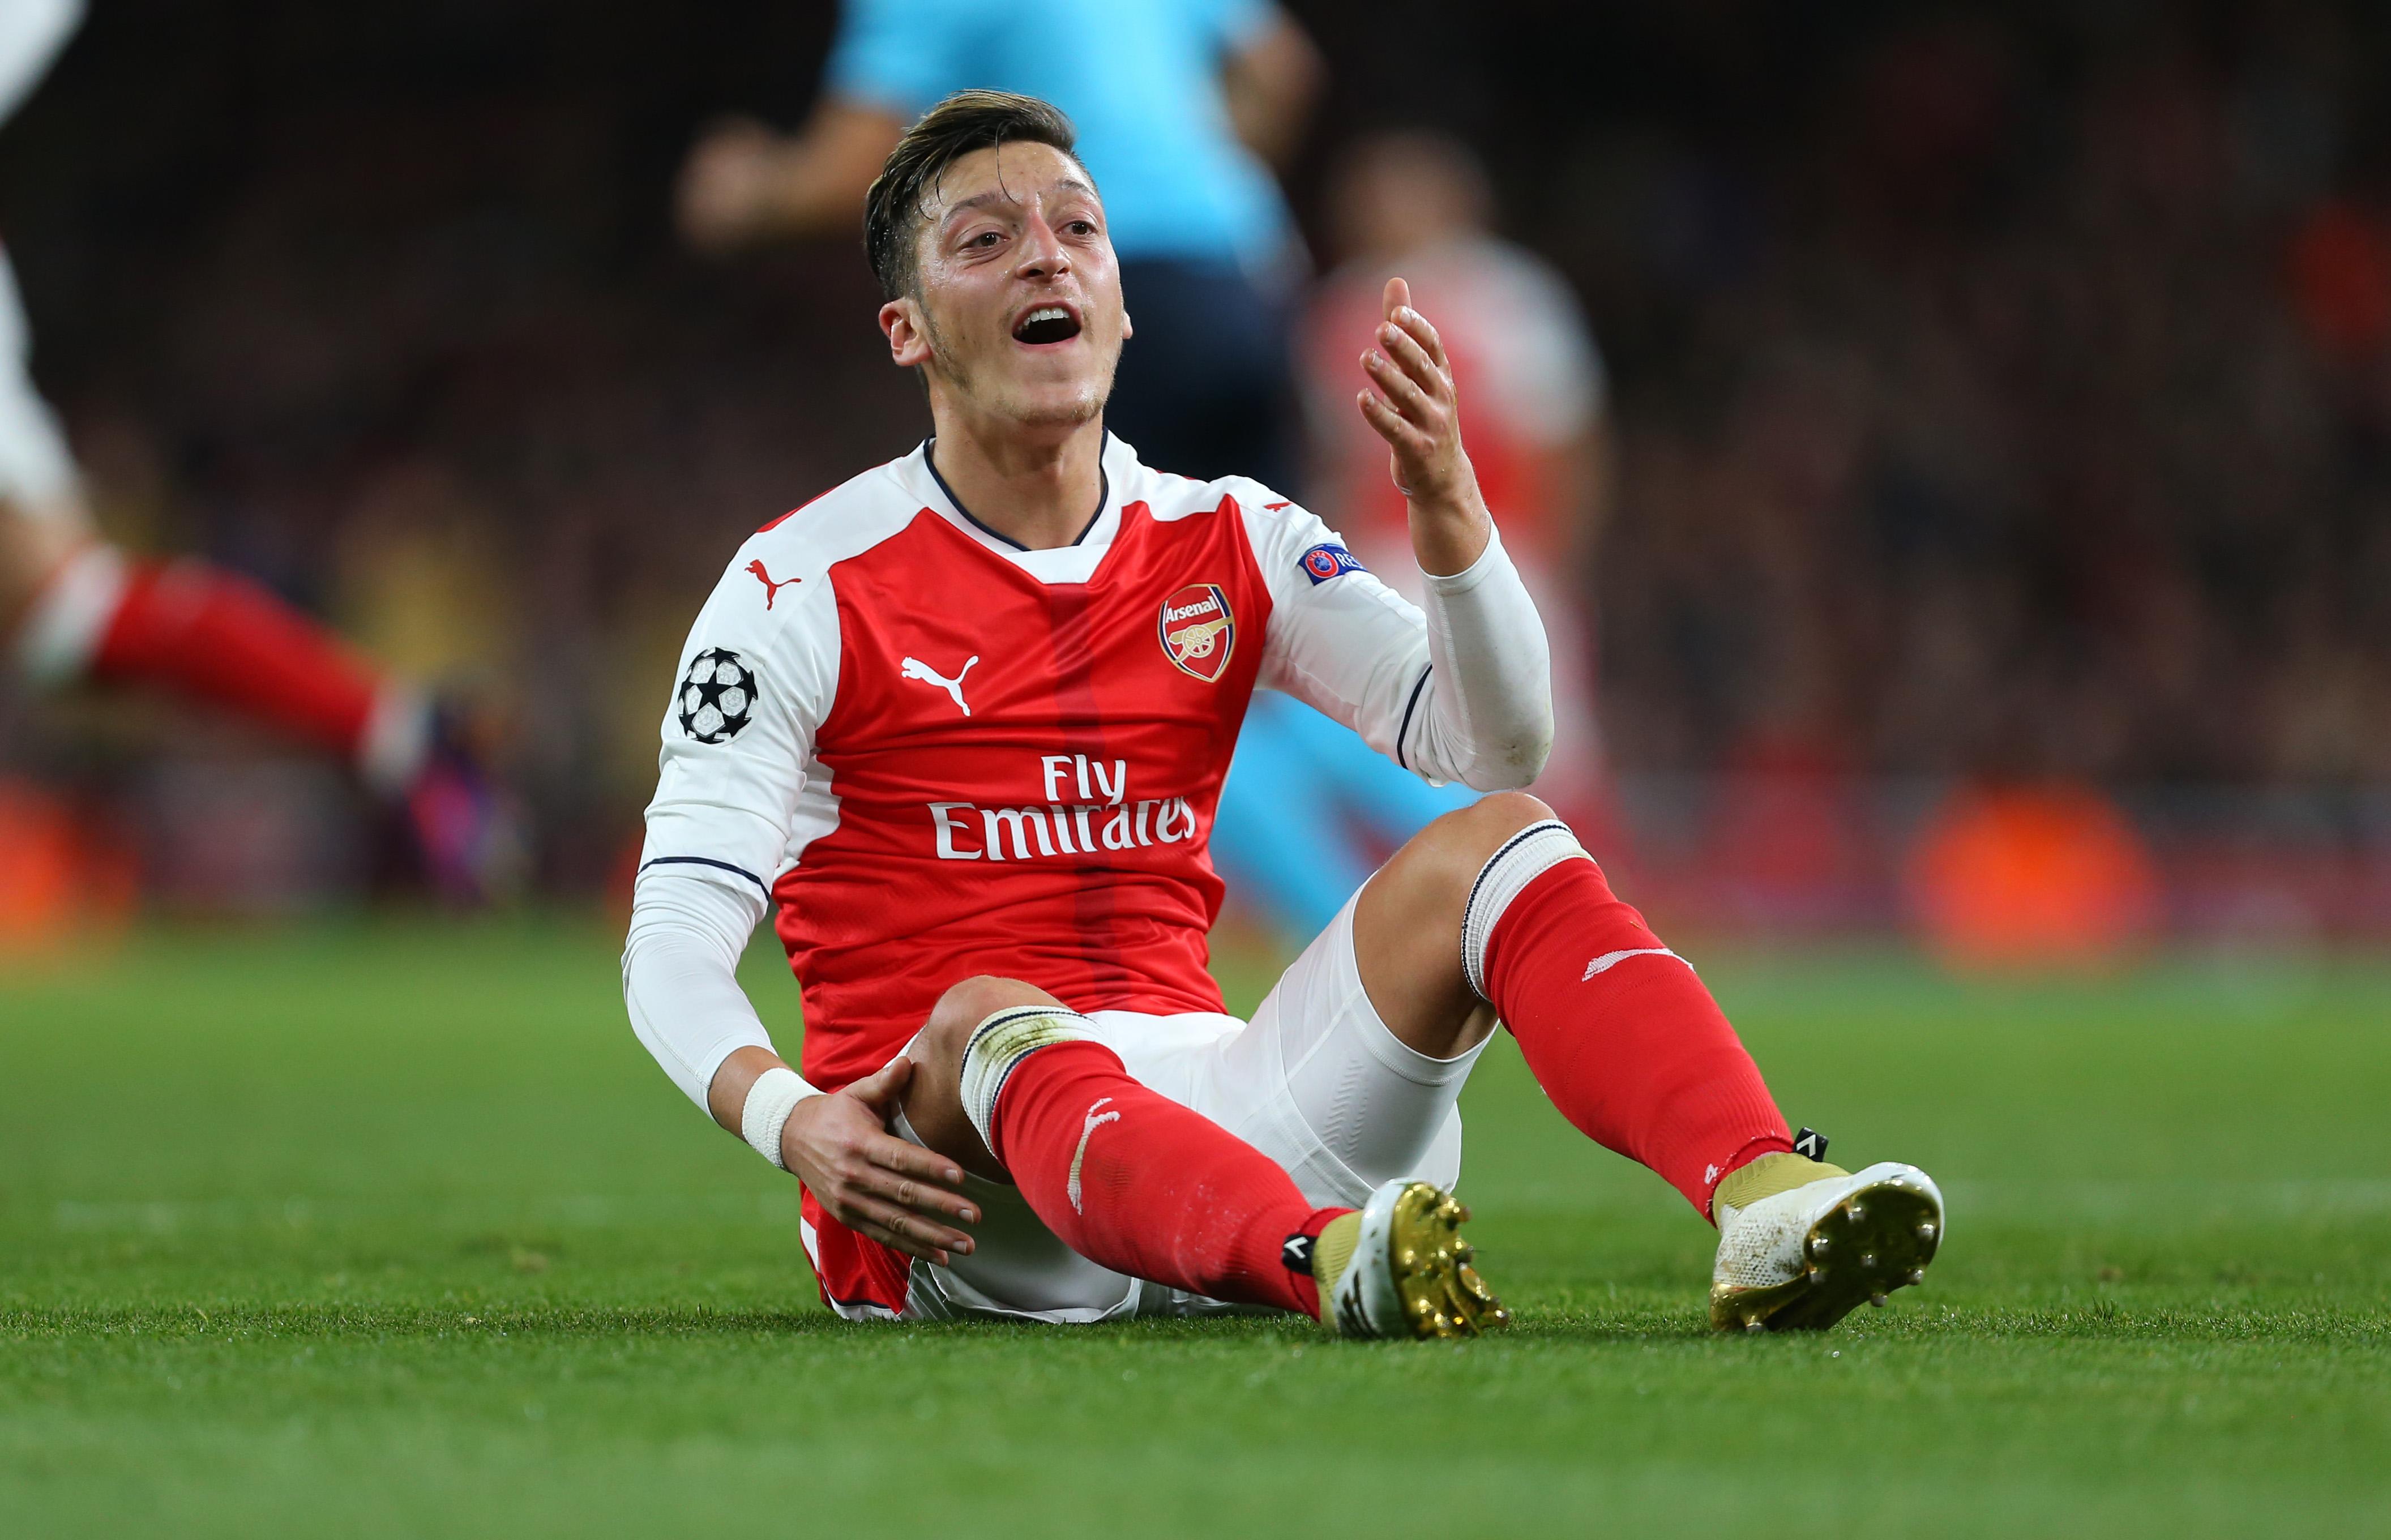 Arsenal star Theo Walcott jokes Mesut Ozil was non-existent in first-half versus Ludogorets